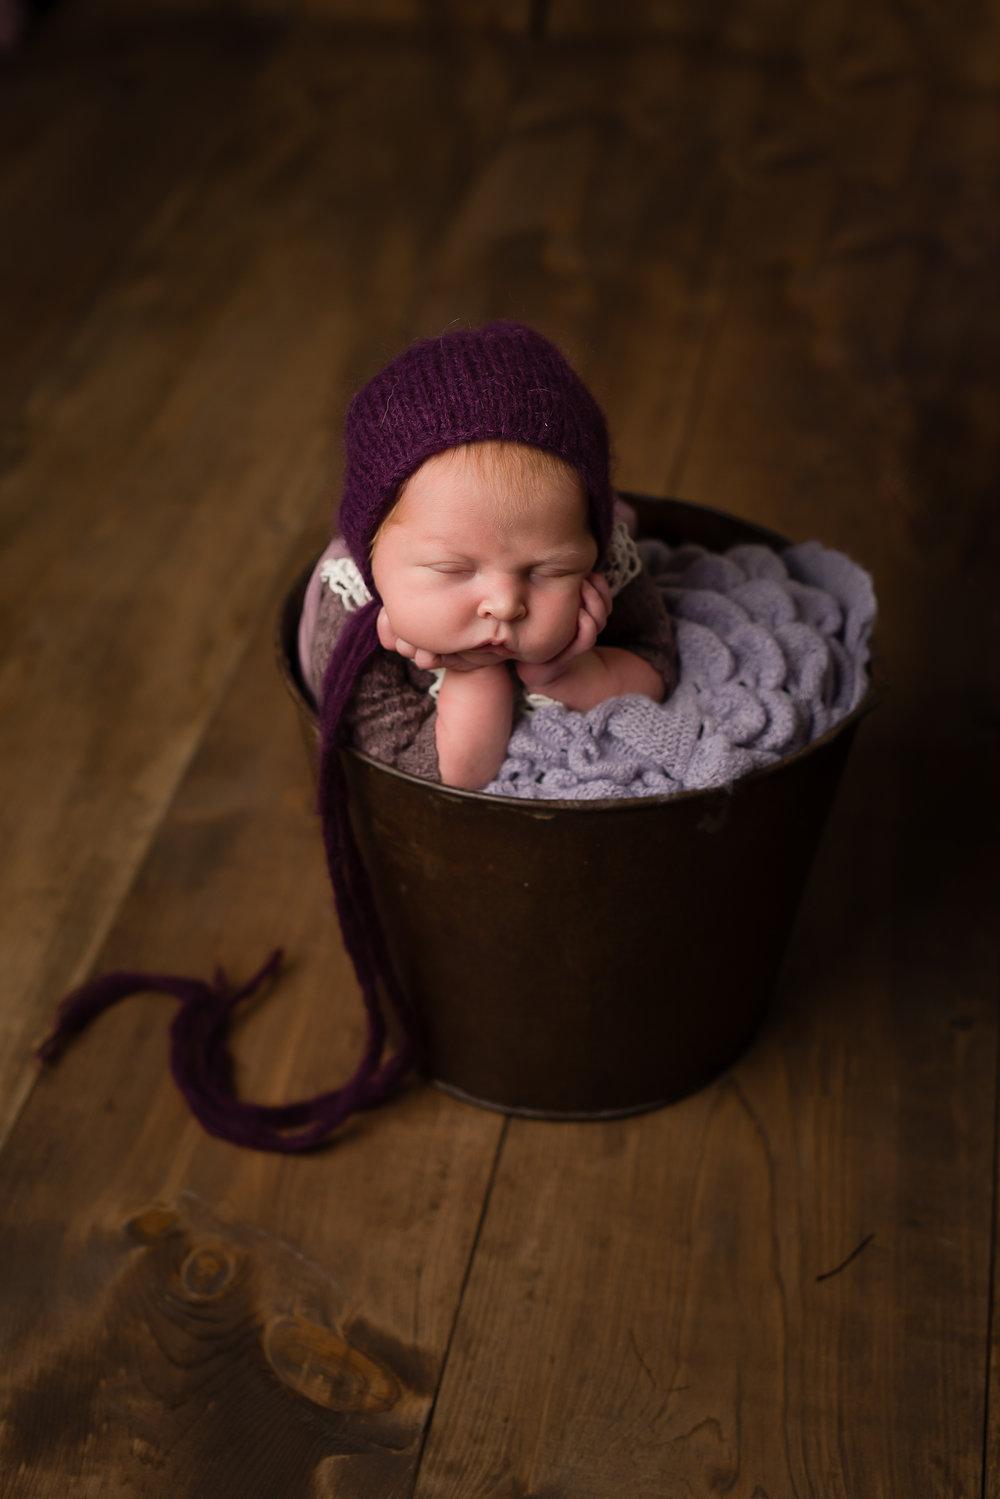 Newborn180NaomiLuciennePhotography072018-Edit-Edit.jpg